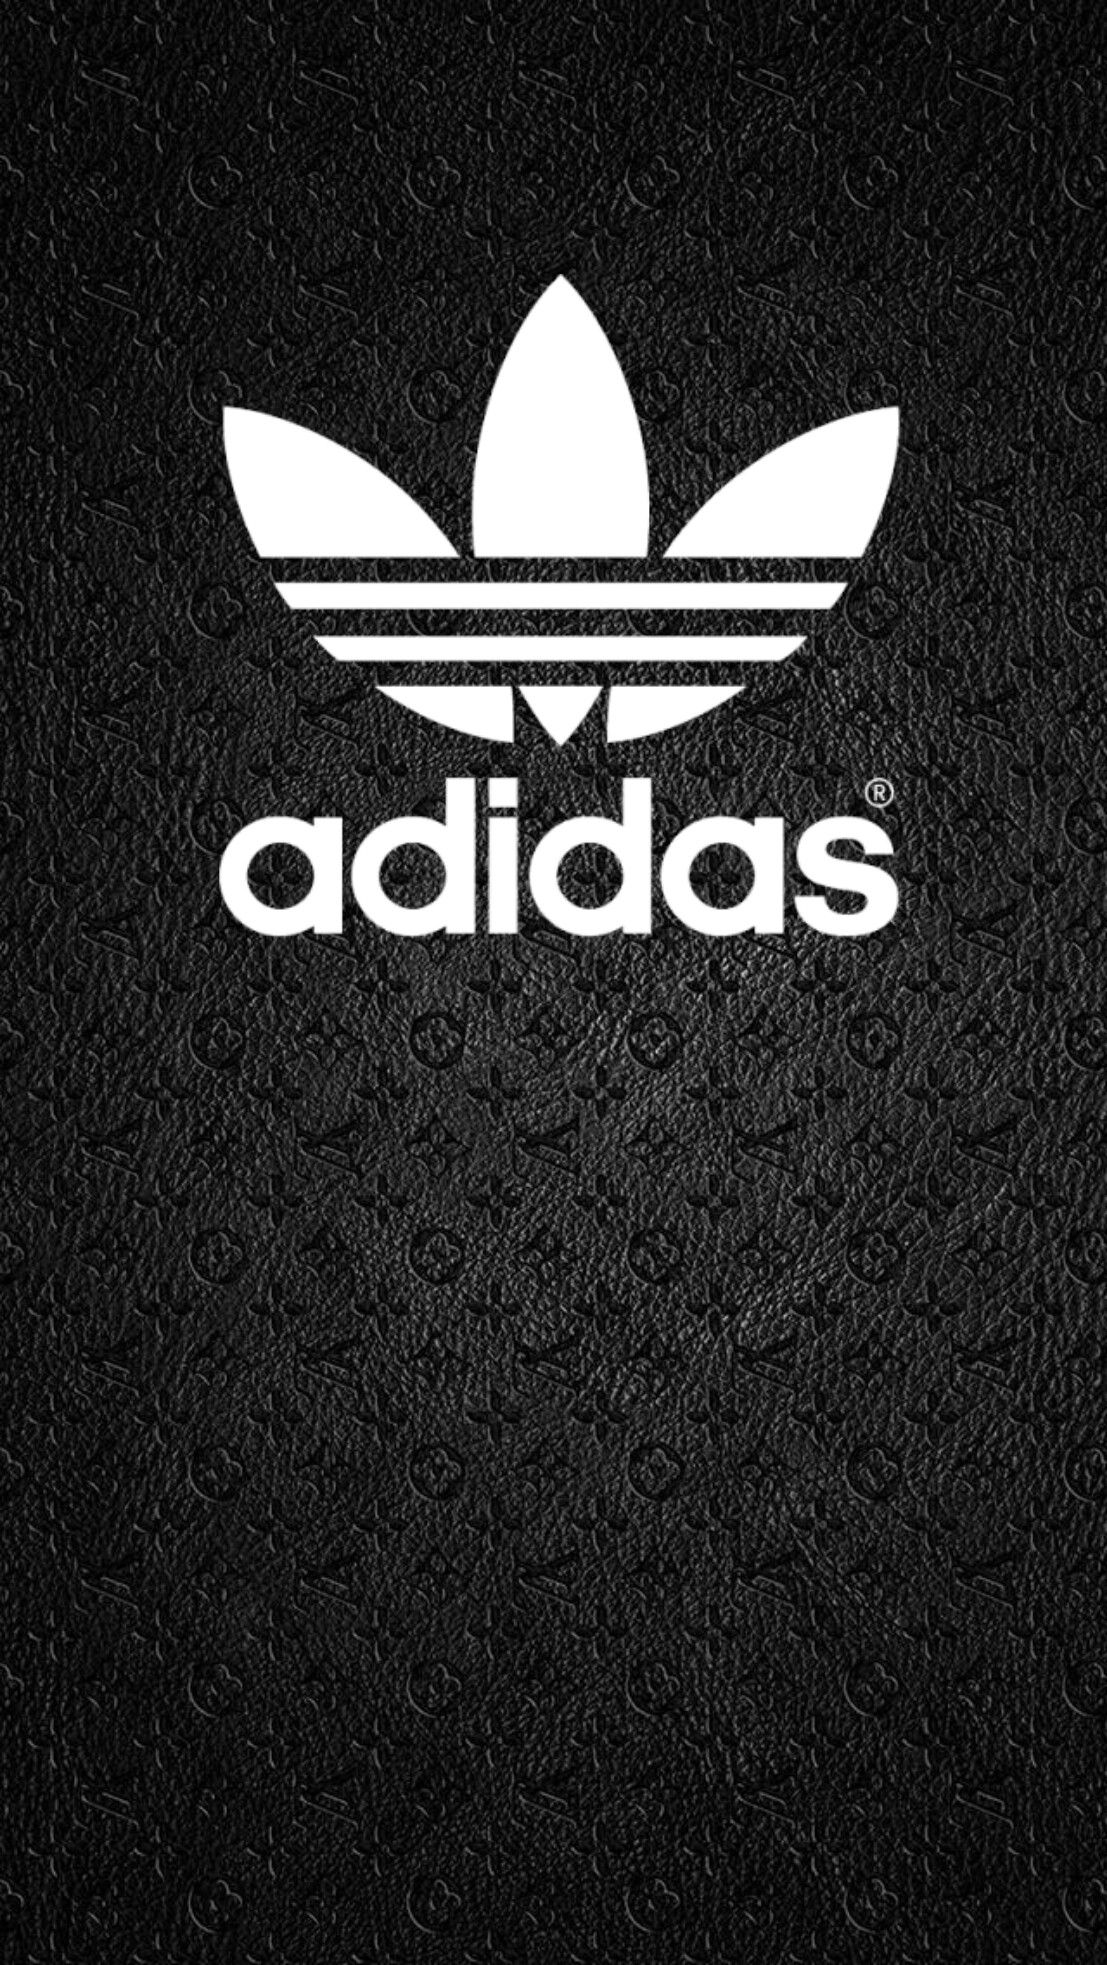 Adidas Logo White On Black BG - Wallpaper/Background ...